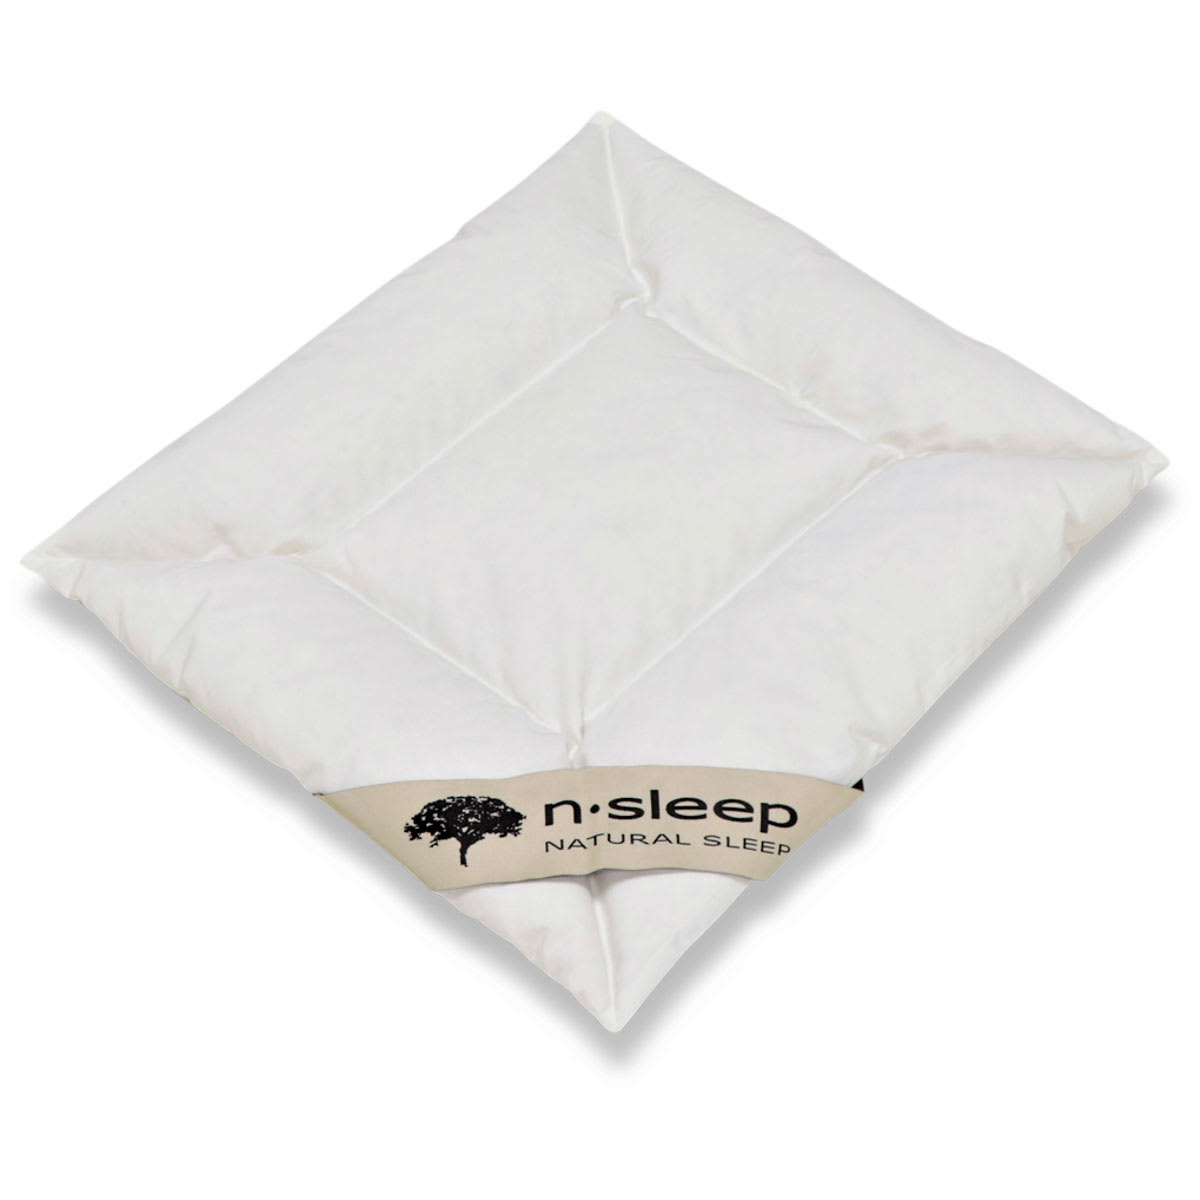 Kapok naturfibre - 40 x 45 cm - Allergivenlig